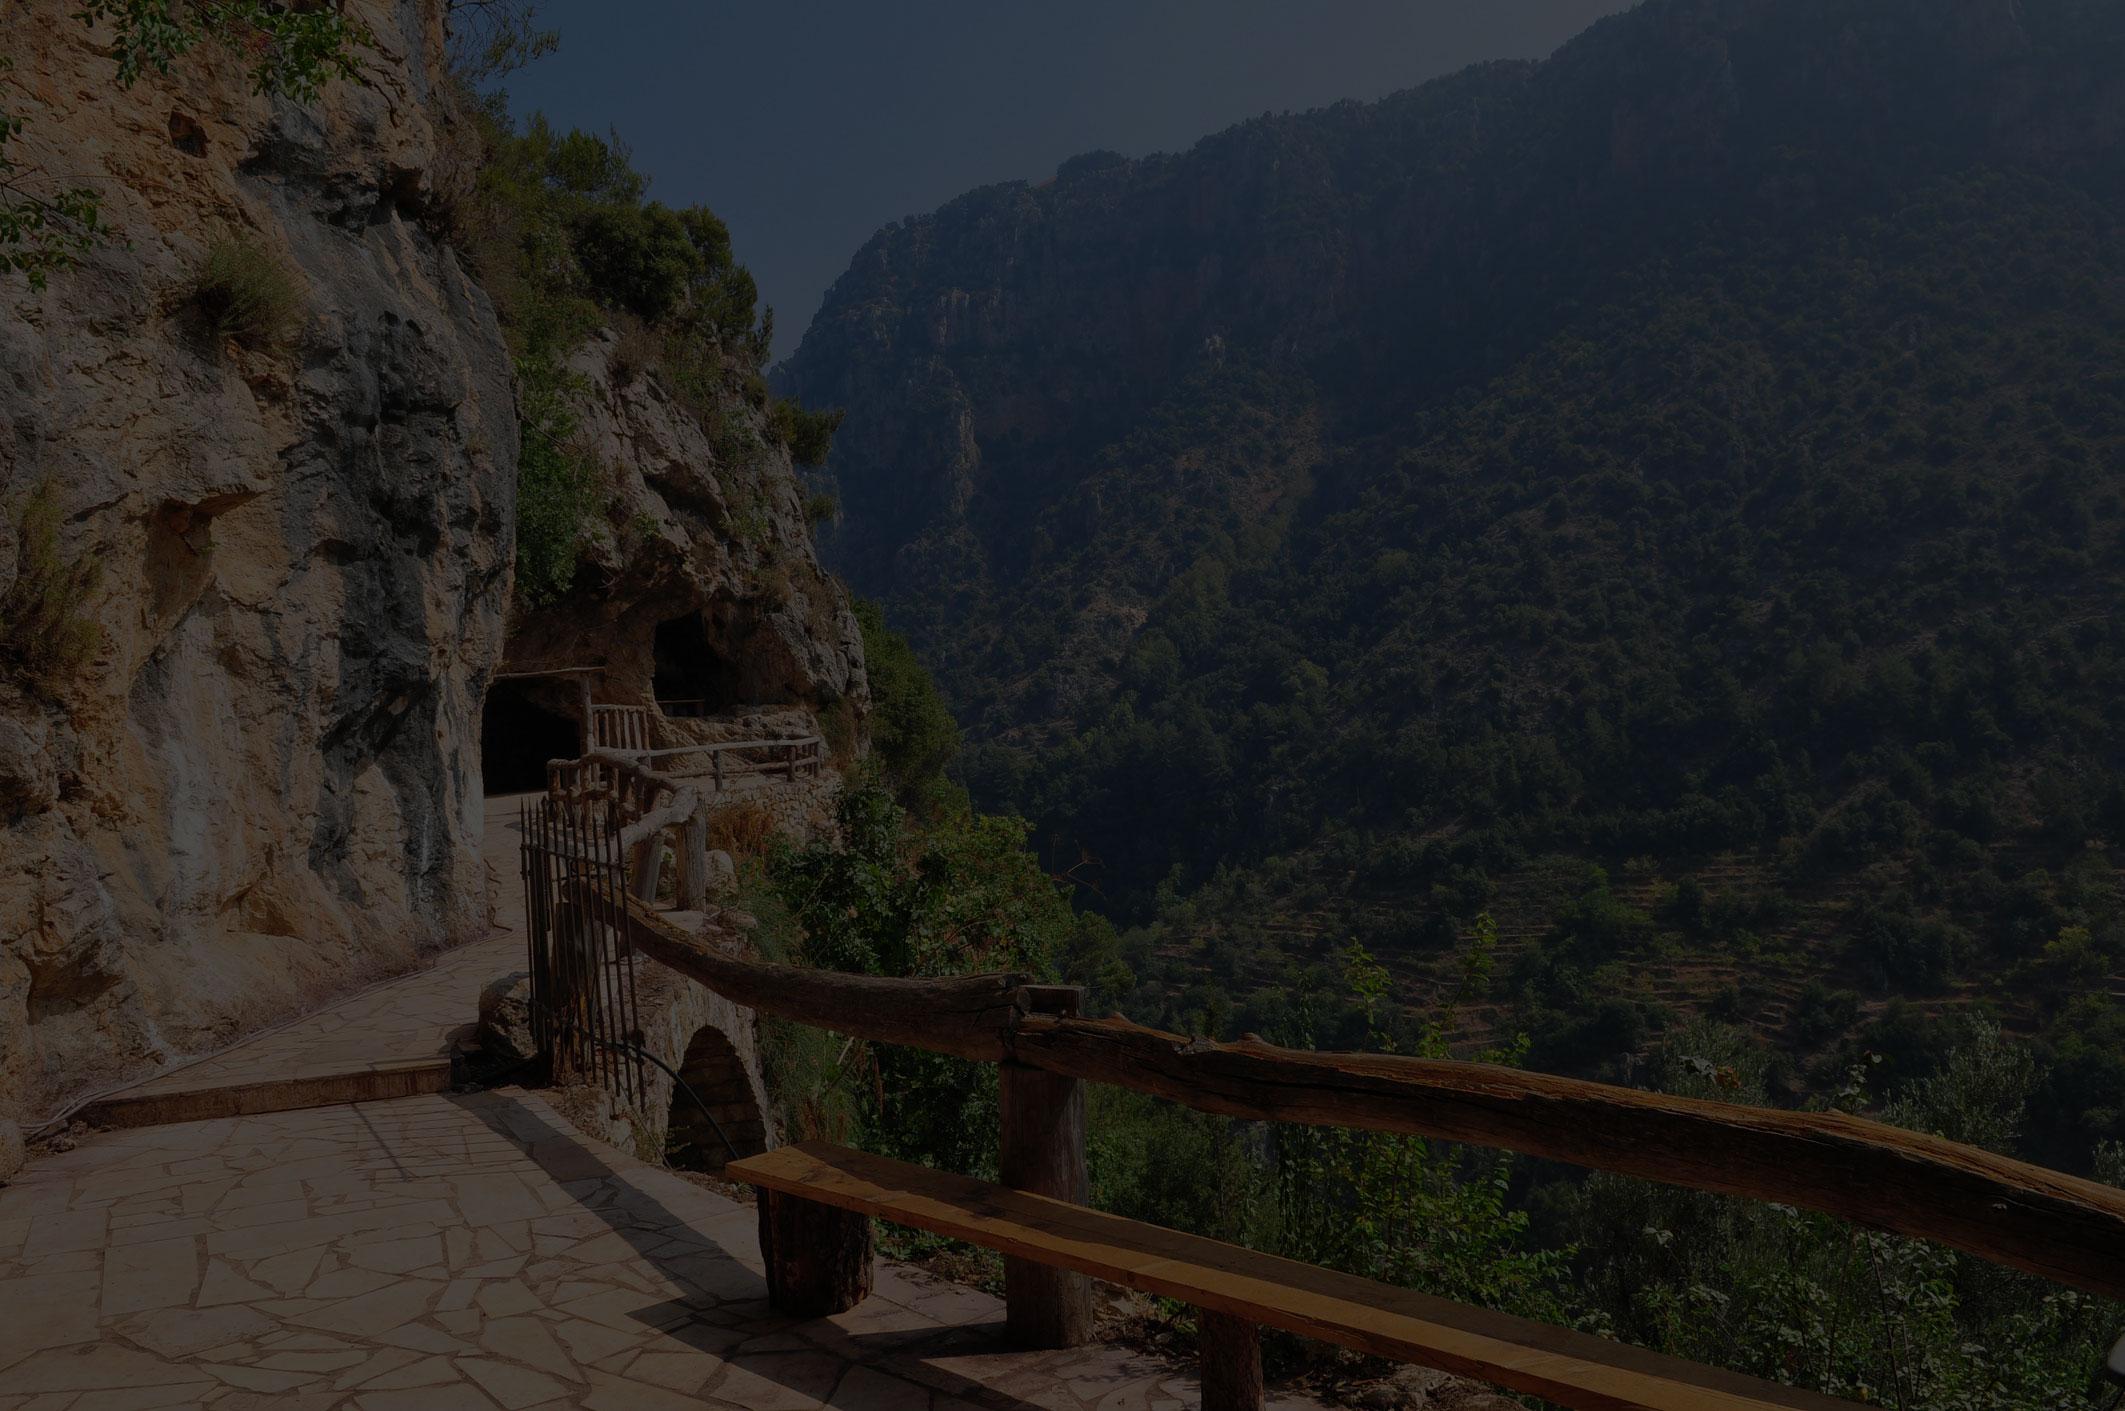 Lebanon Mountain Trail darkened